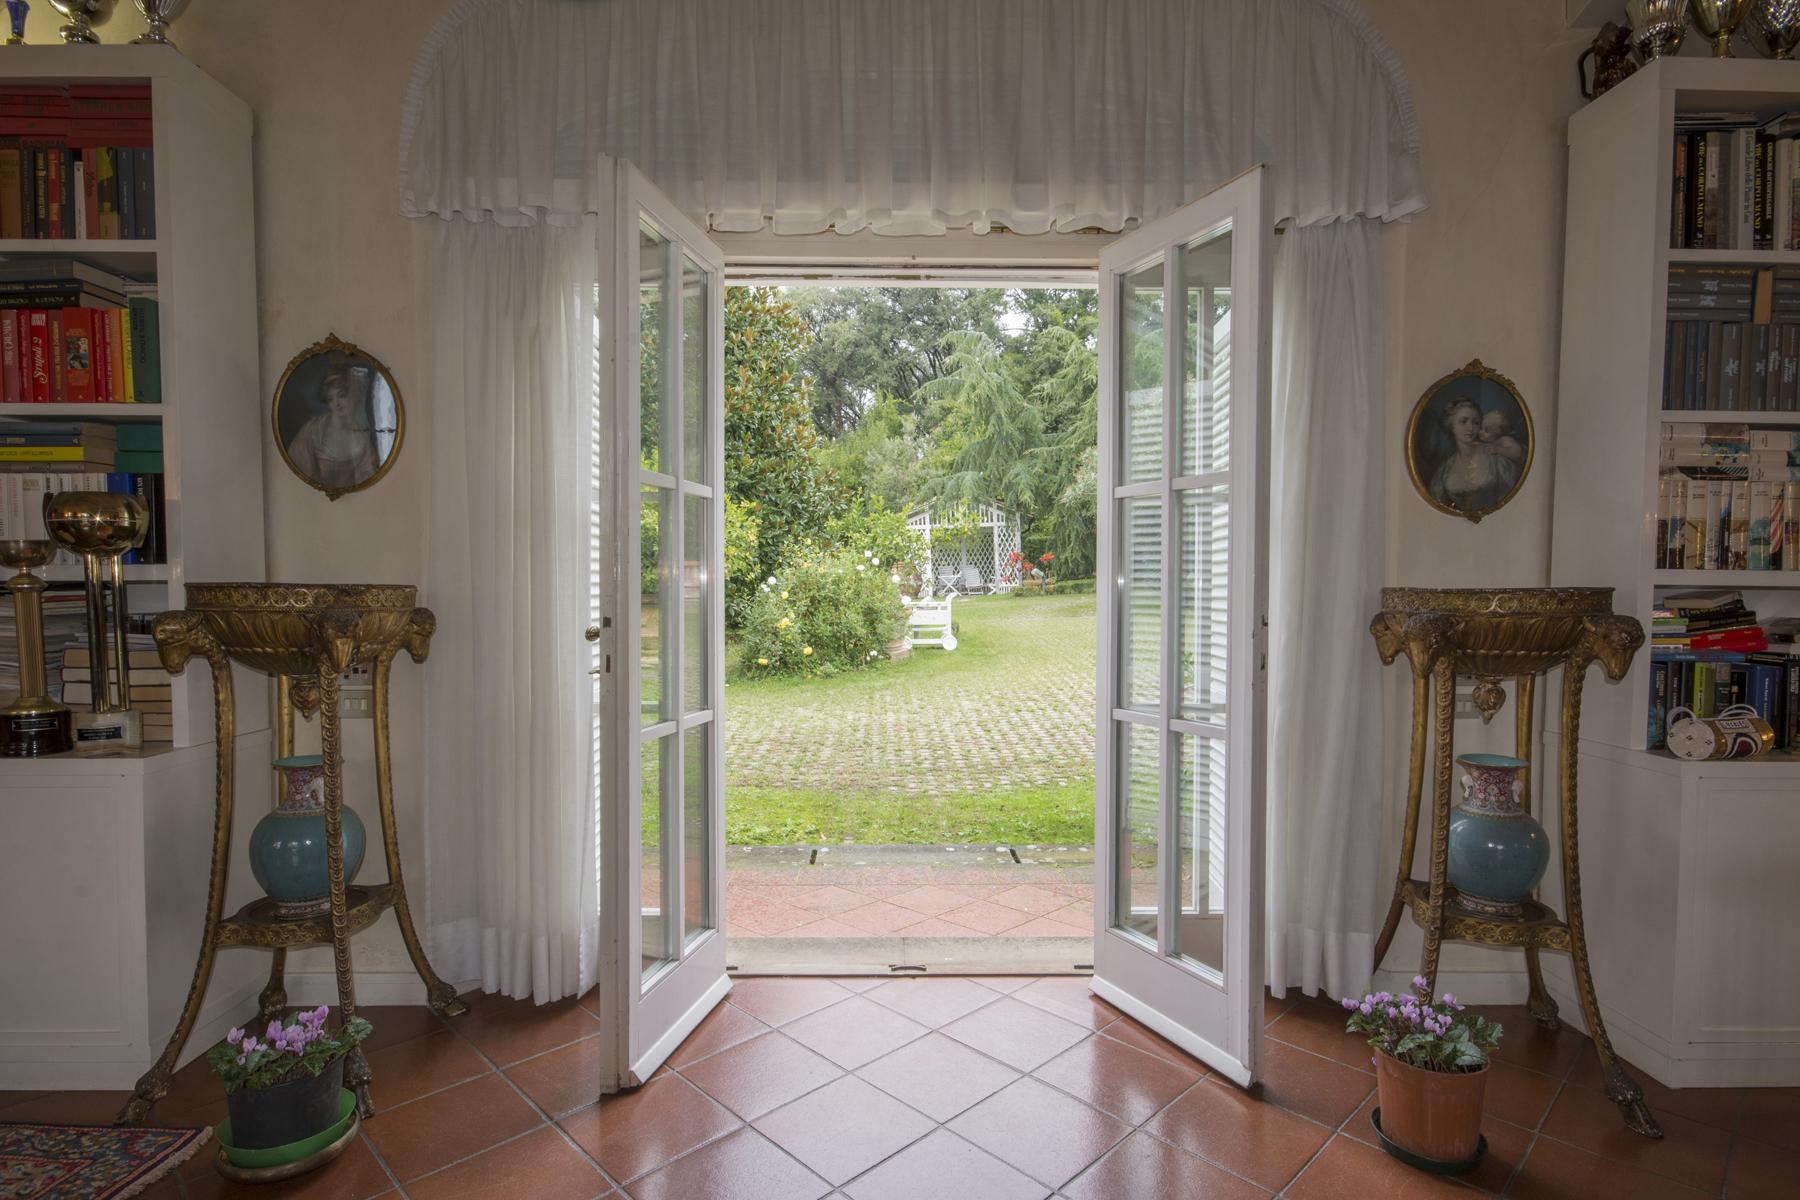 Villa in Vendita a Lucca: 5 locali, 2451 mq - Foto 8